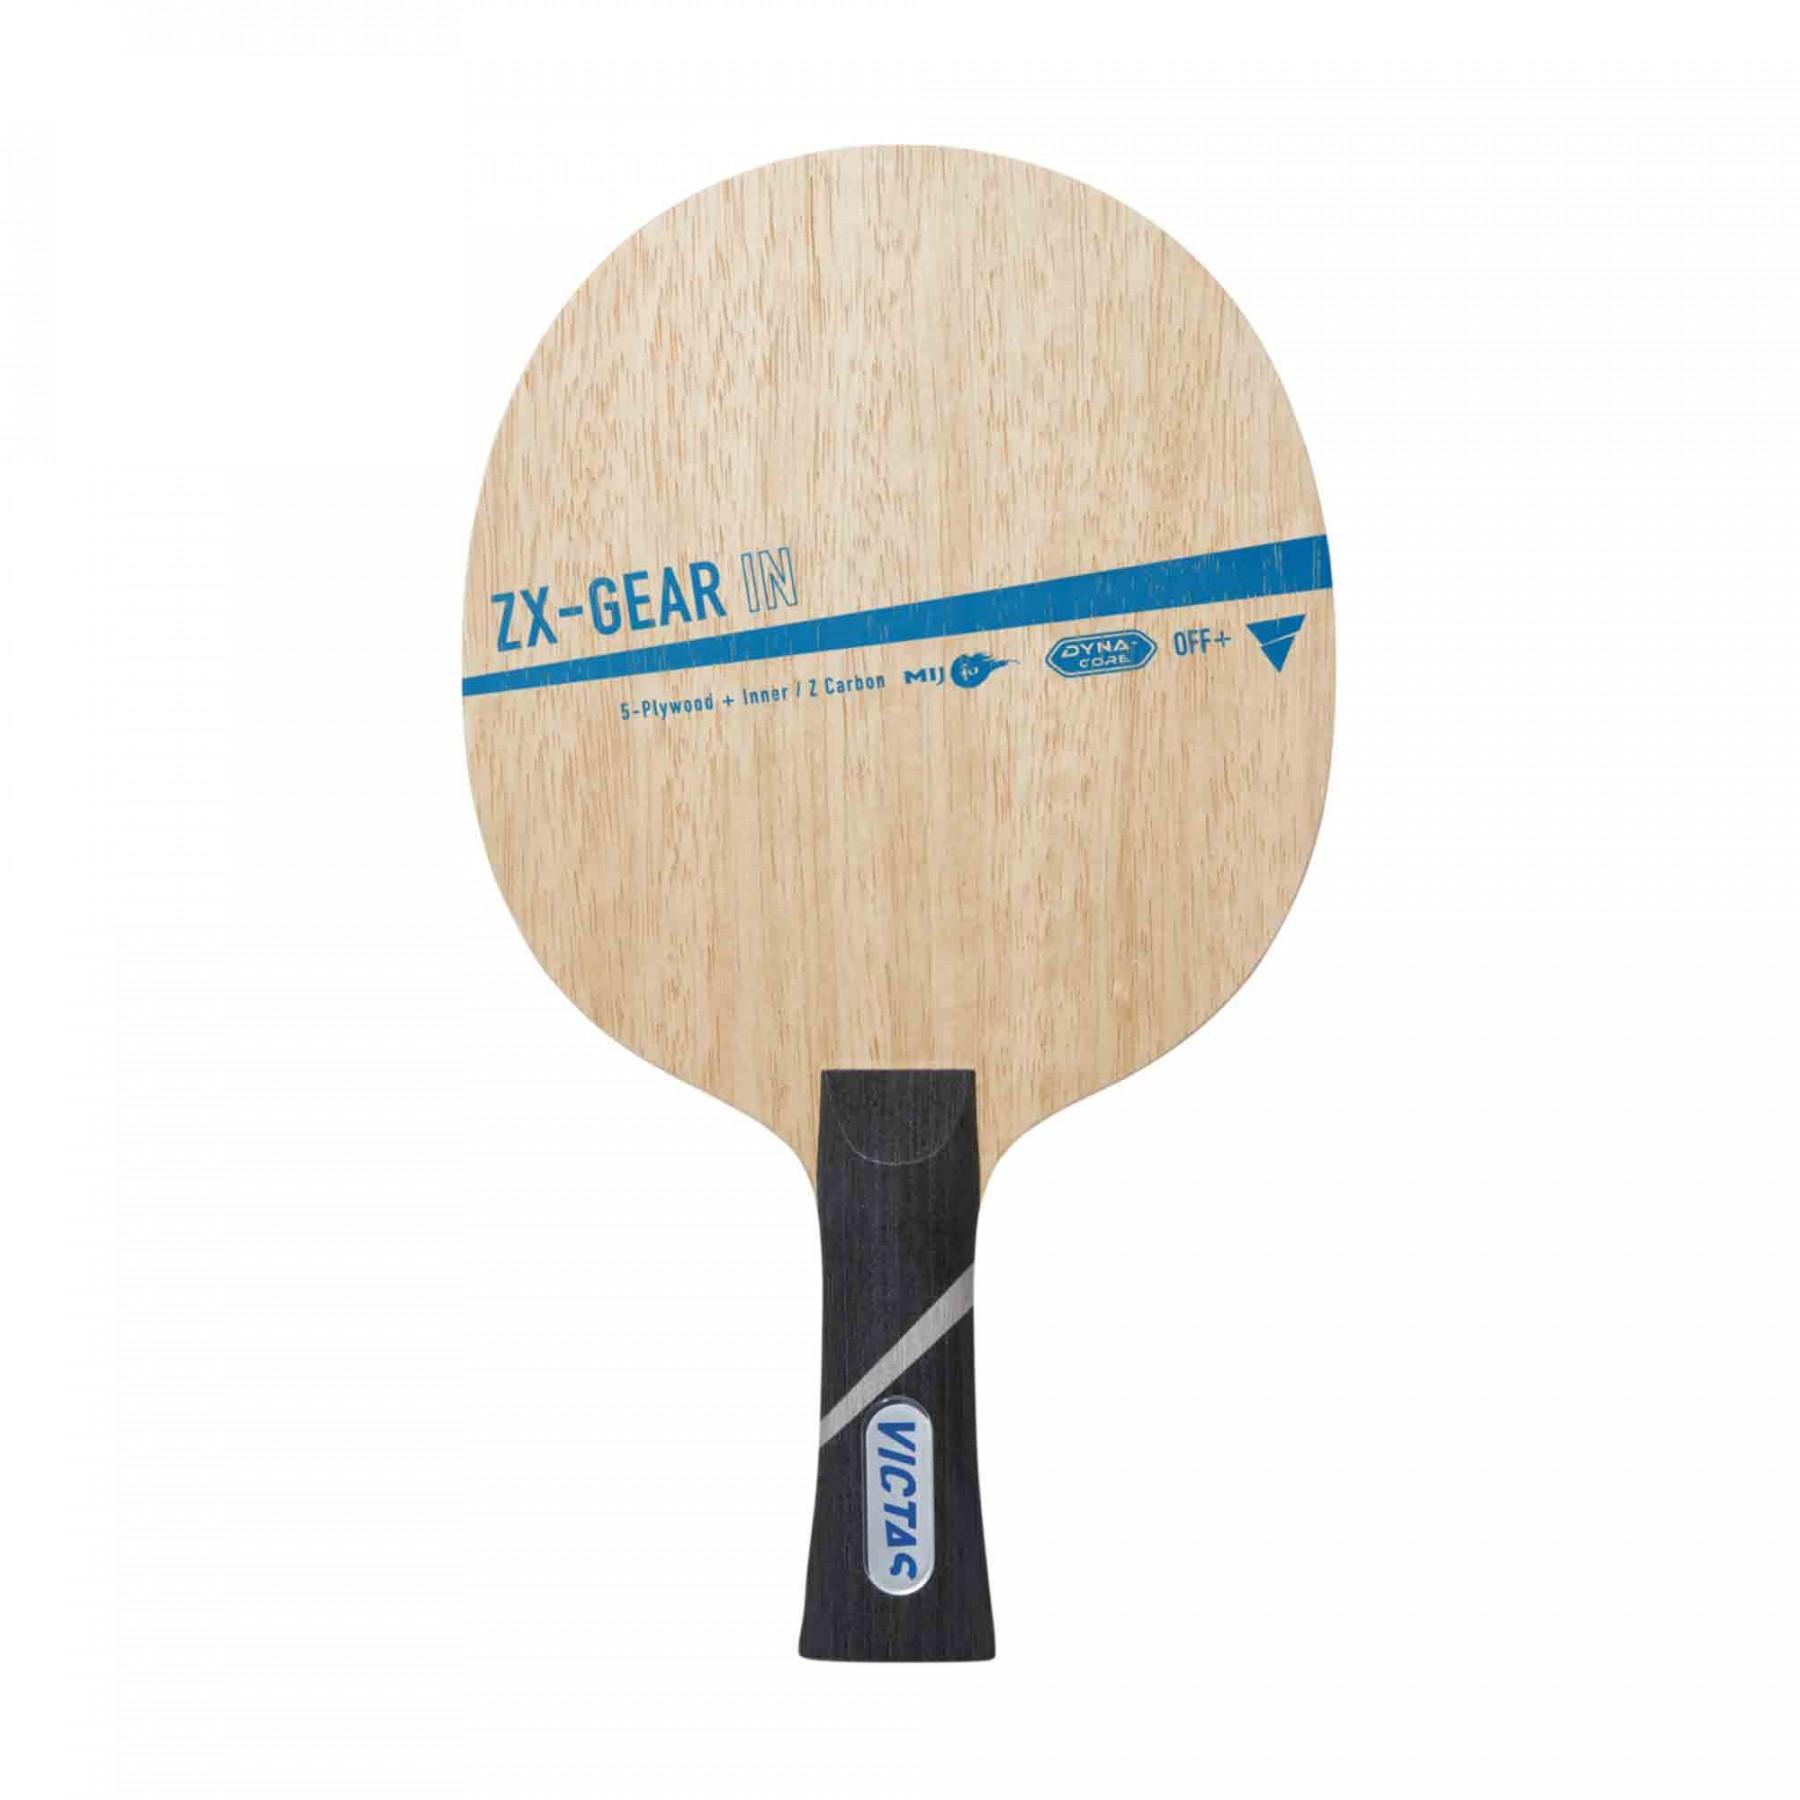 Swell Victas Zx Gear In Table Tennis Blade Interior Design Ideas Oteneahmetsinanyavuzinfo